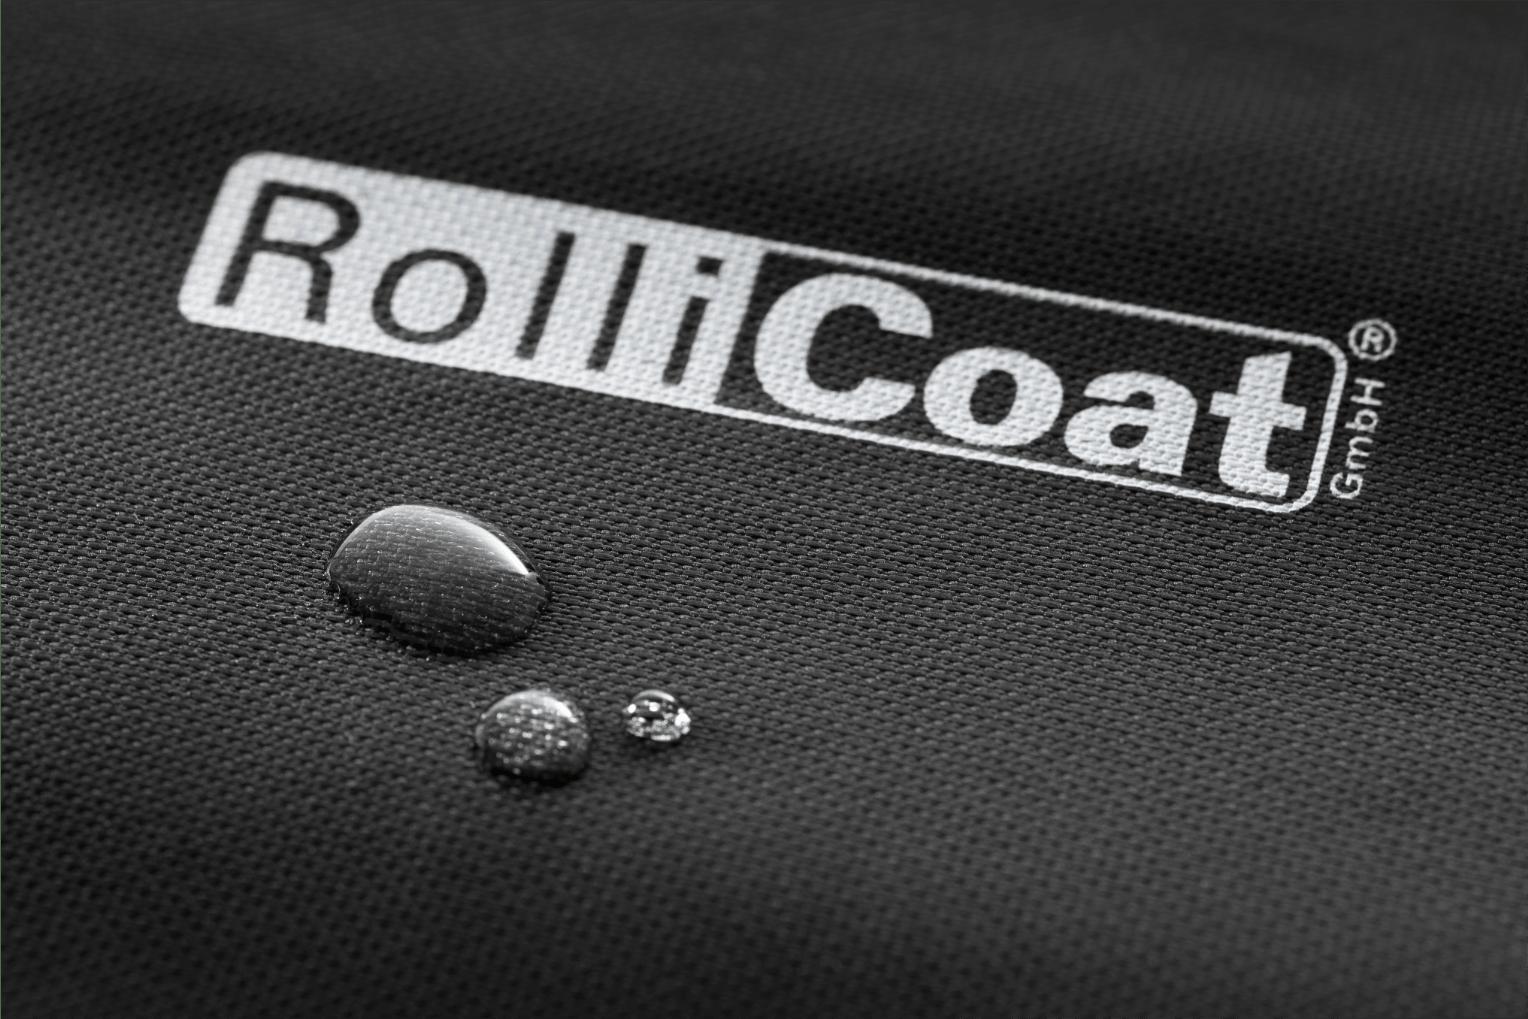 Rollicoat | wasserfestes Material